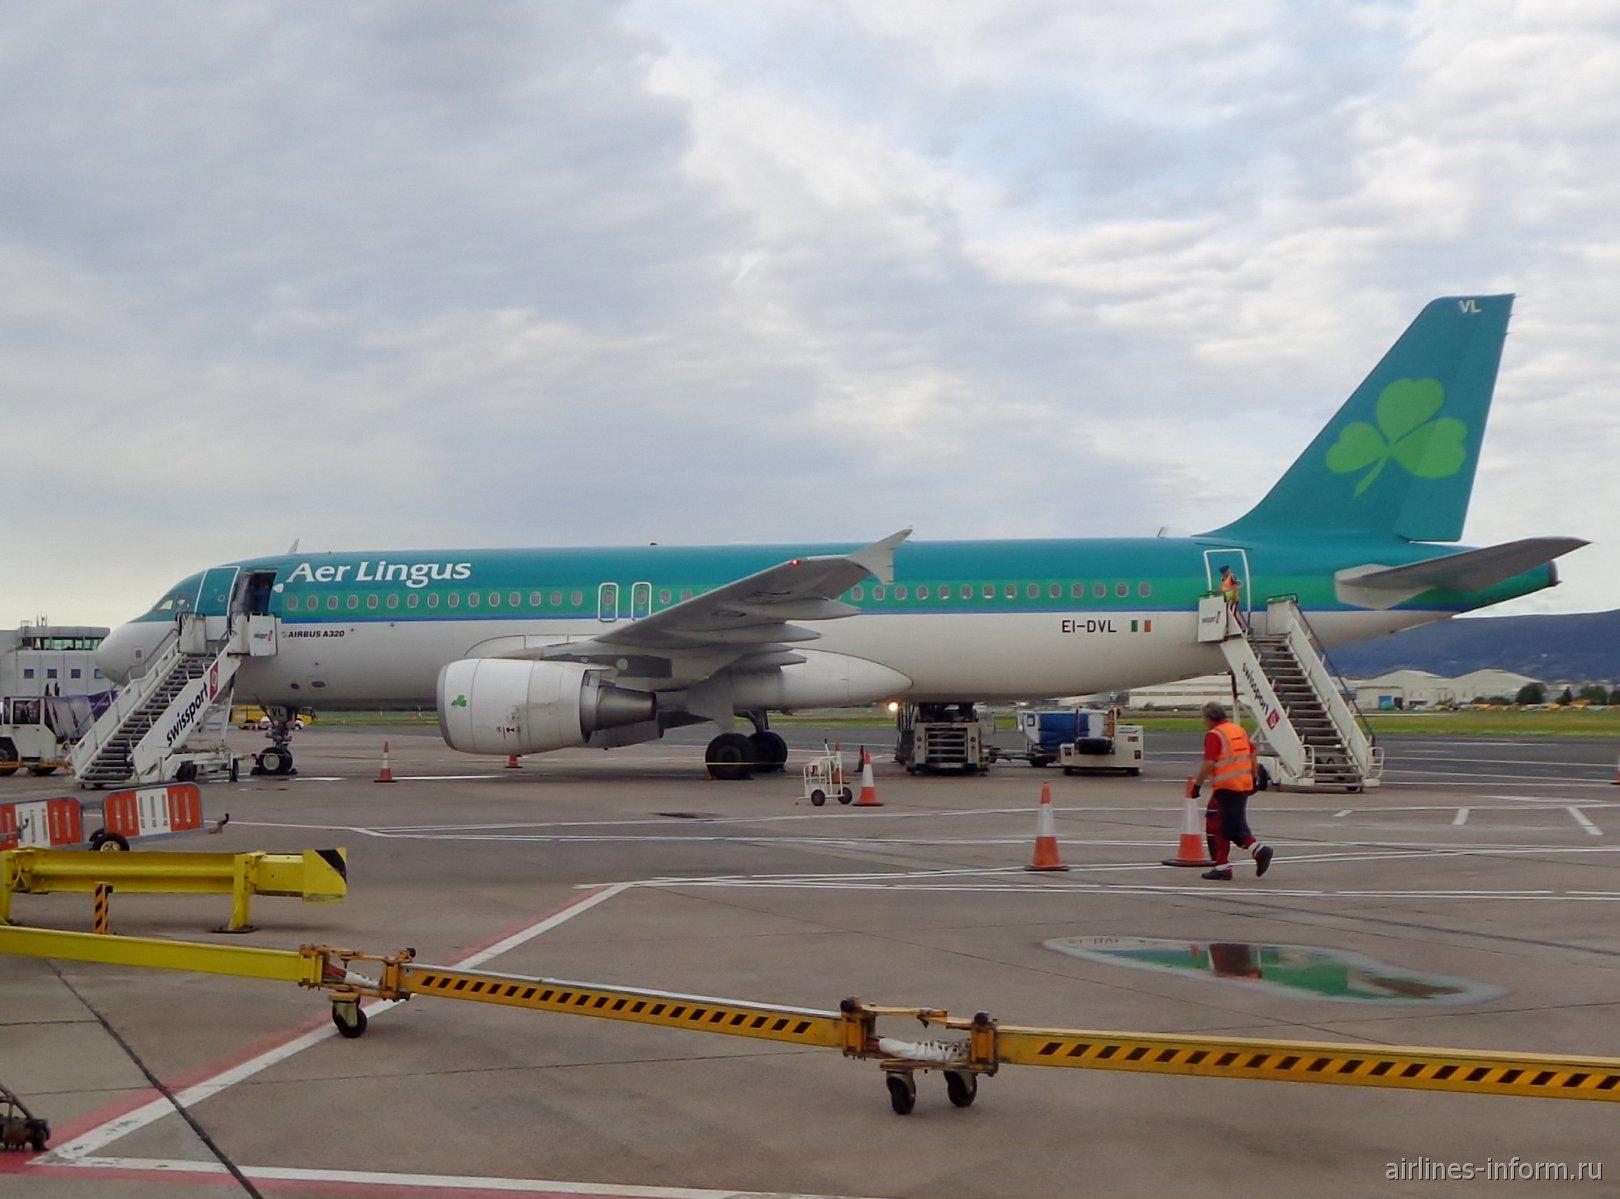 Самолет Airbus А320 EI-DVL авиакомпании Aer Lingus в аэропорту Белфаст-Сити